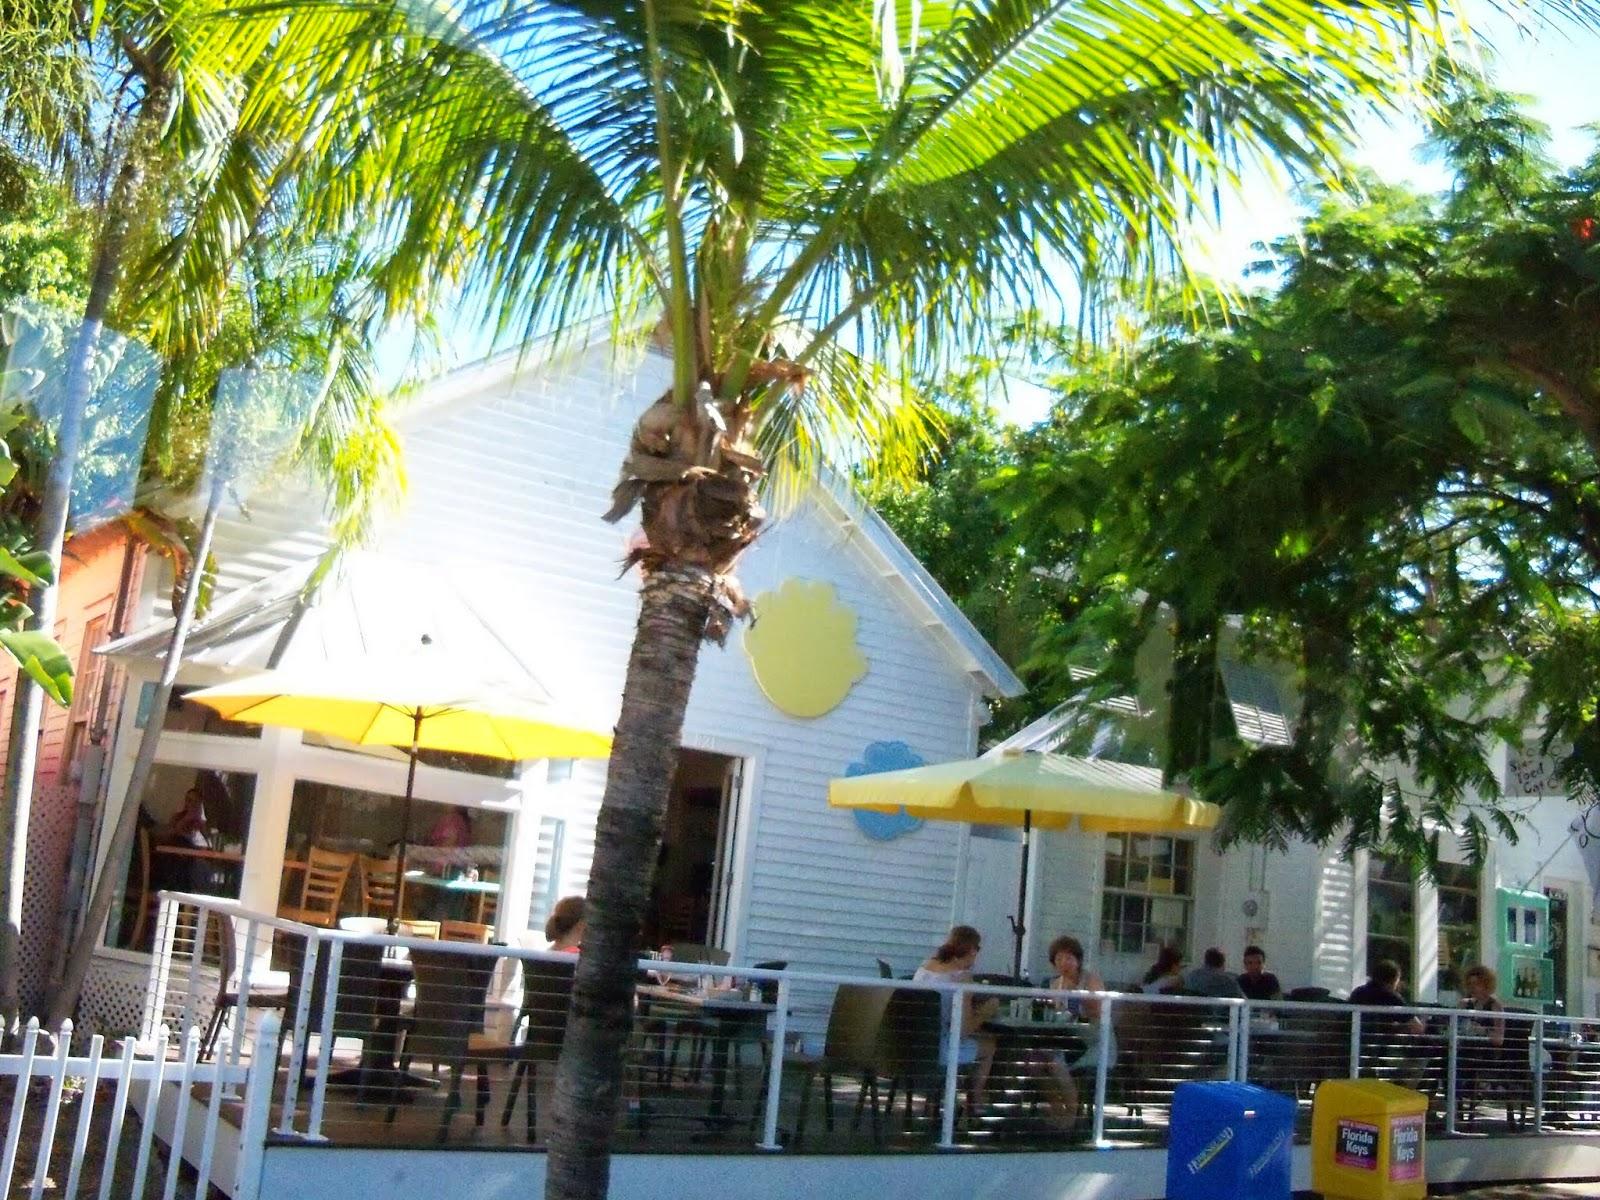 Key West Vacation - 116_5739.JPG